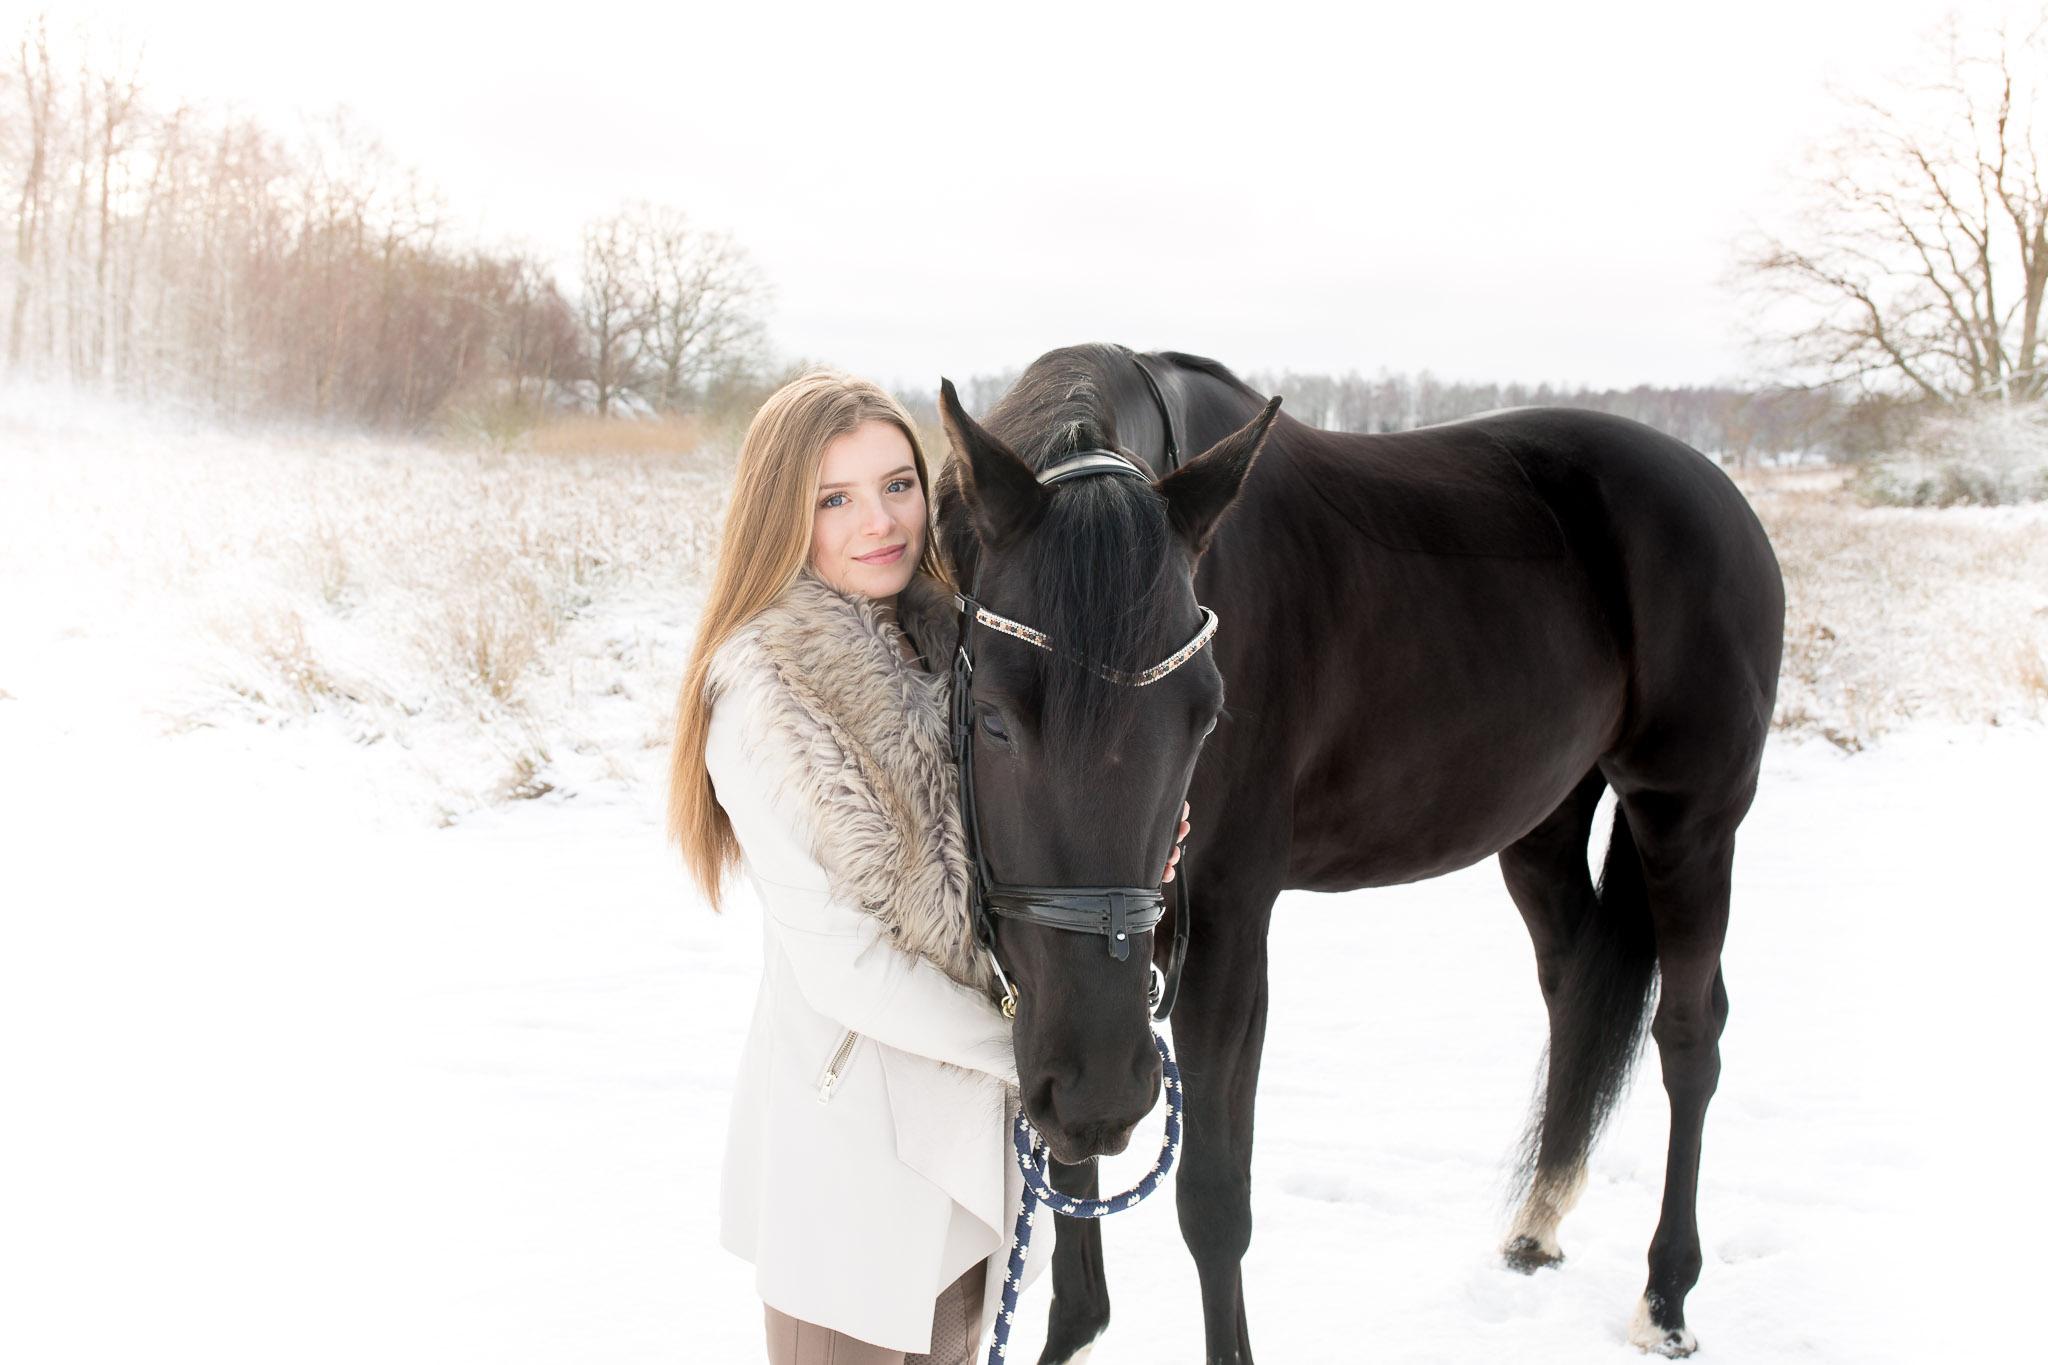 Annatarfoto Ebba Nilsson Ebba dressage Vapiano Torkö Ronneby